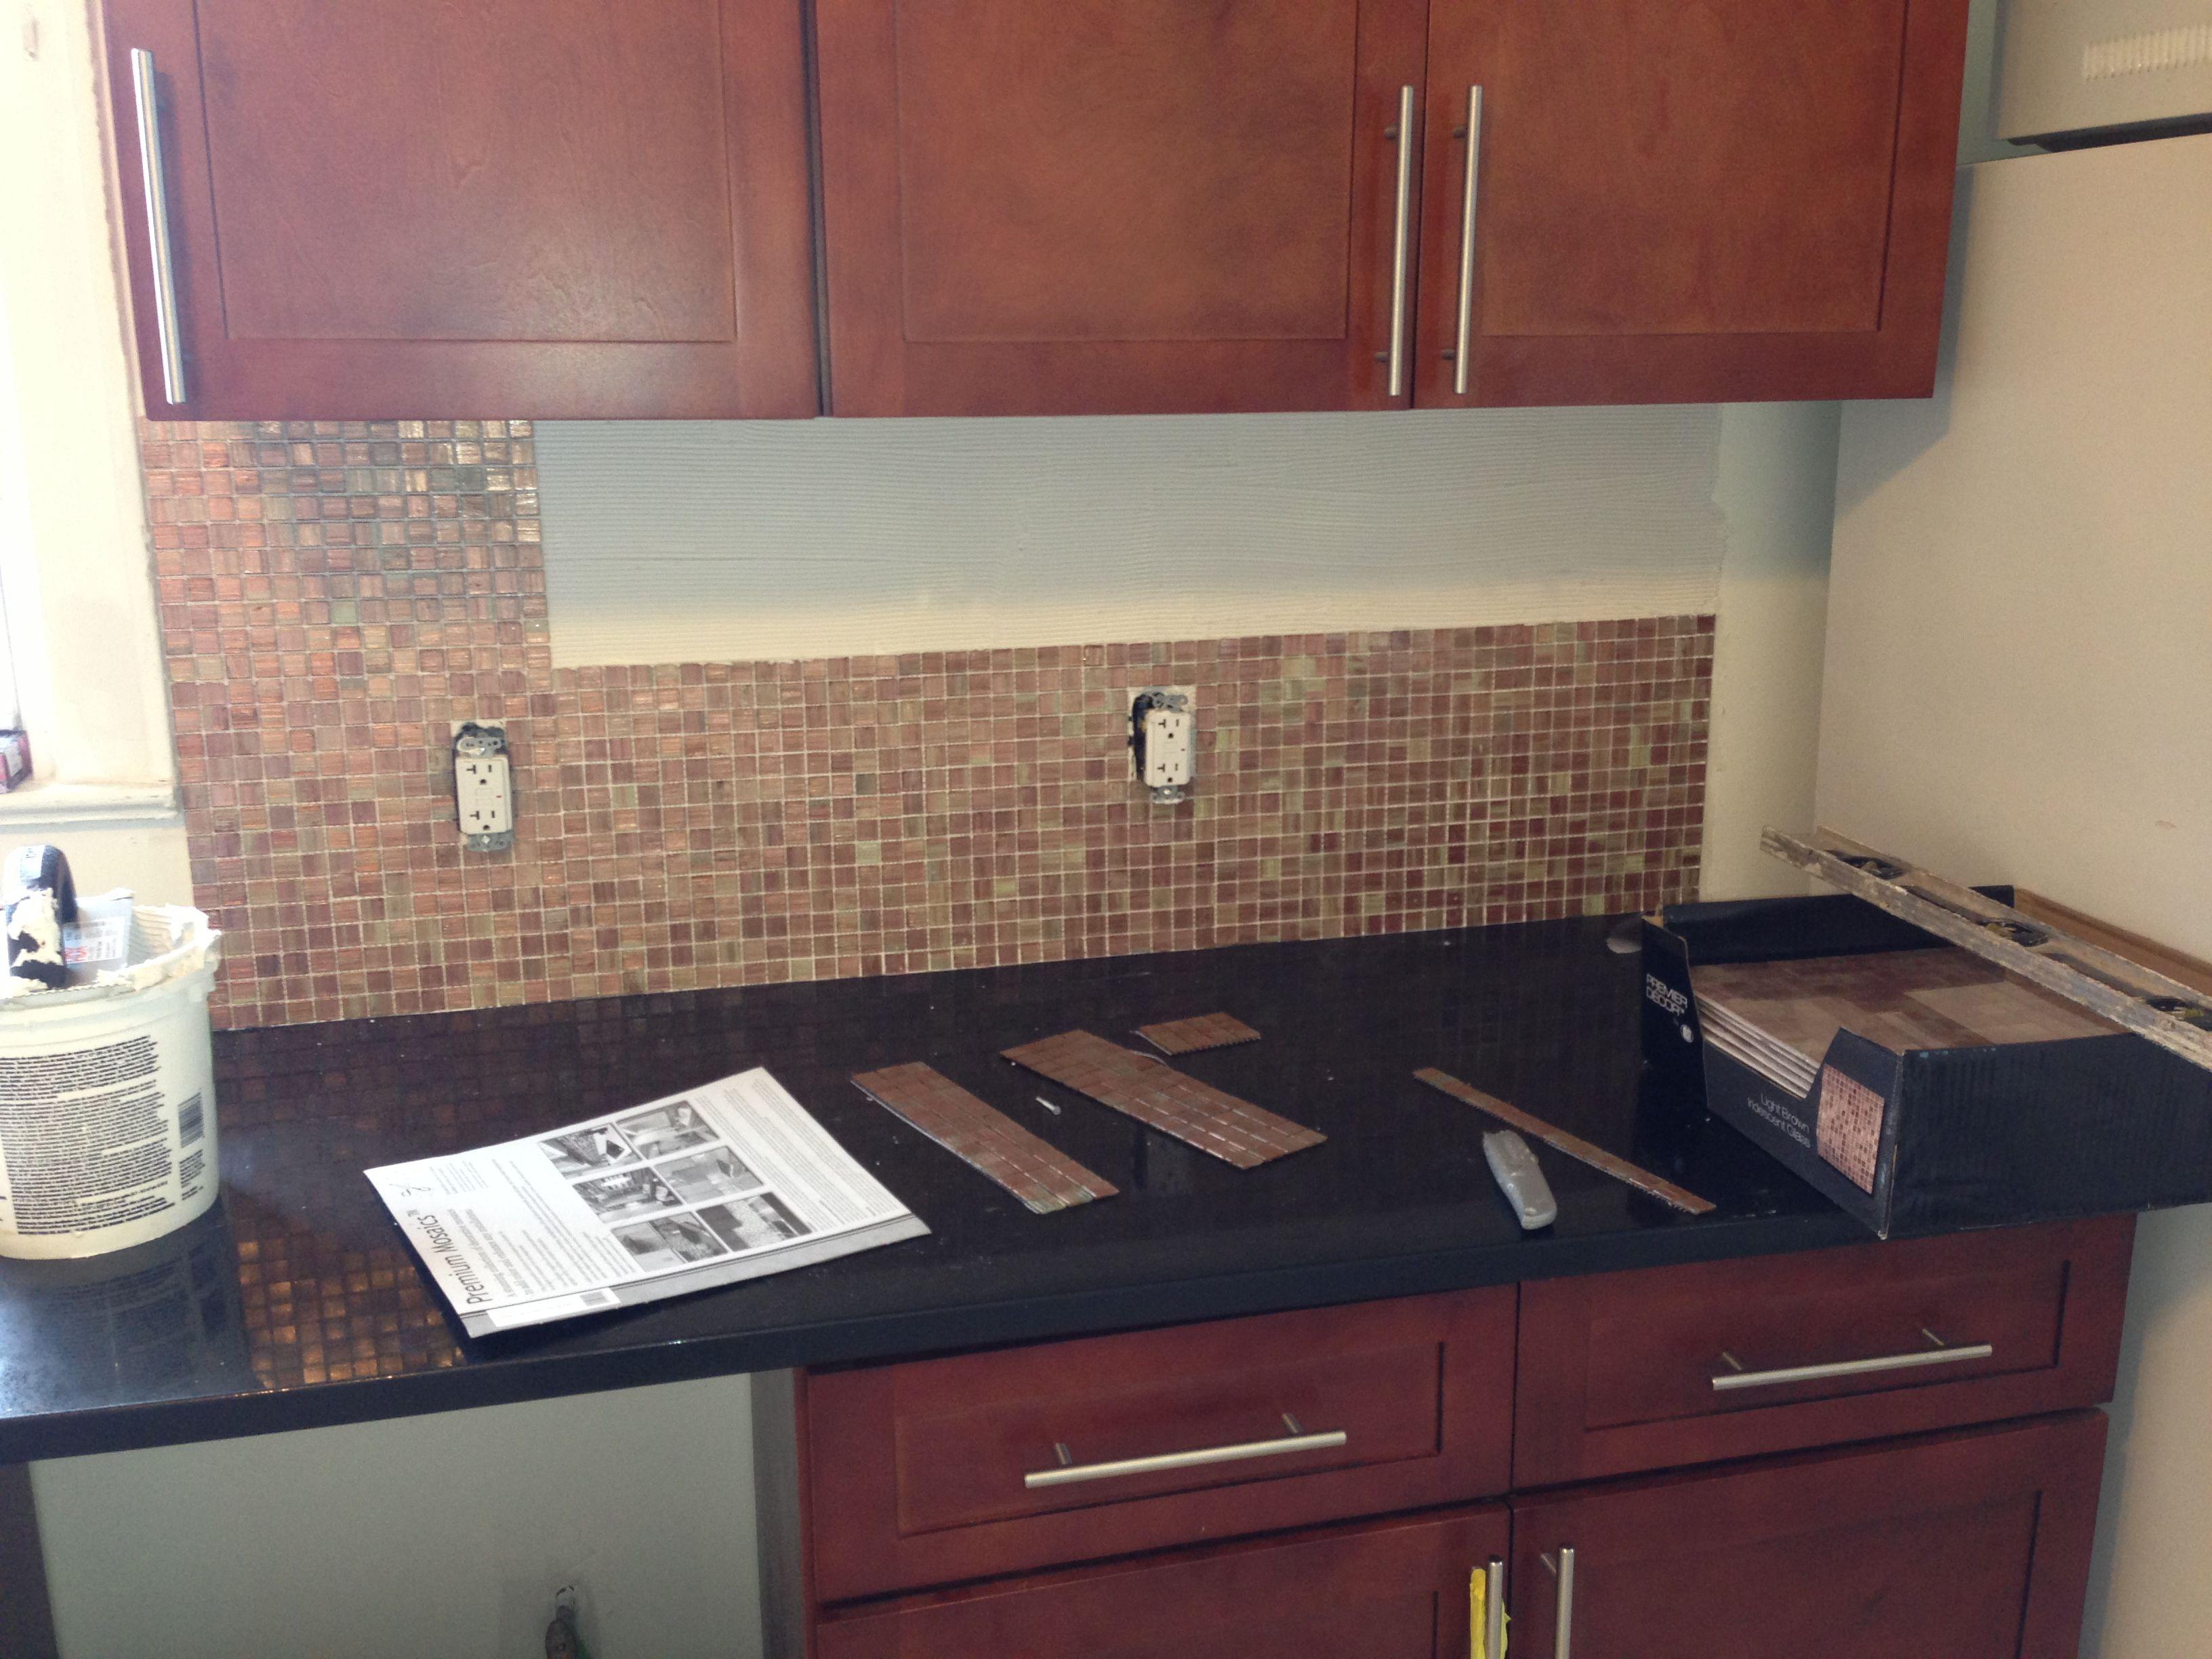 Ceramic Tile Kitchen Backsplash Bergen County Nj If You Are Looking To Renew Or Refresh Your Ceramic T Kitchen Tile Kitchen Design Kitchen Tiles Backsplash